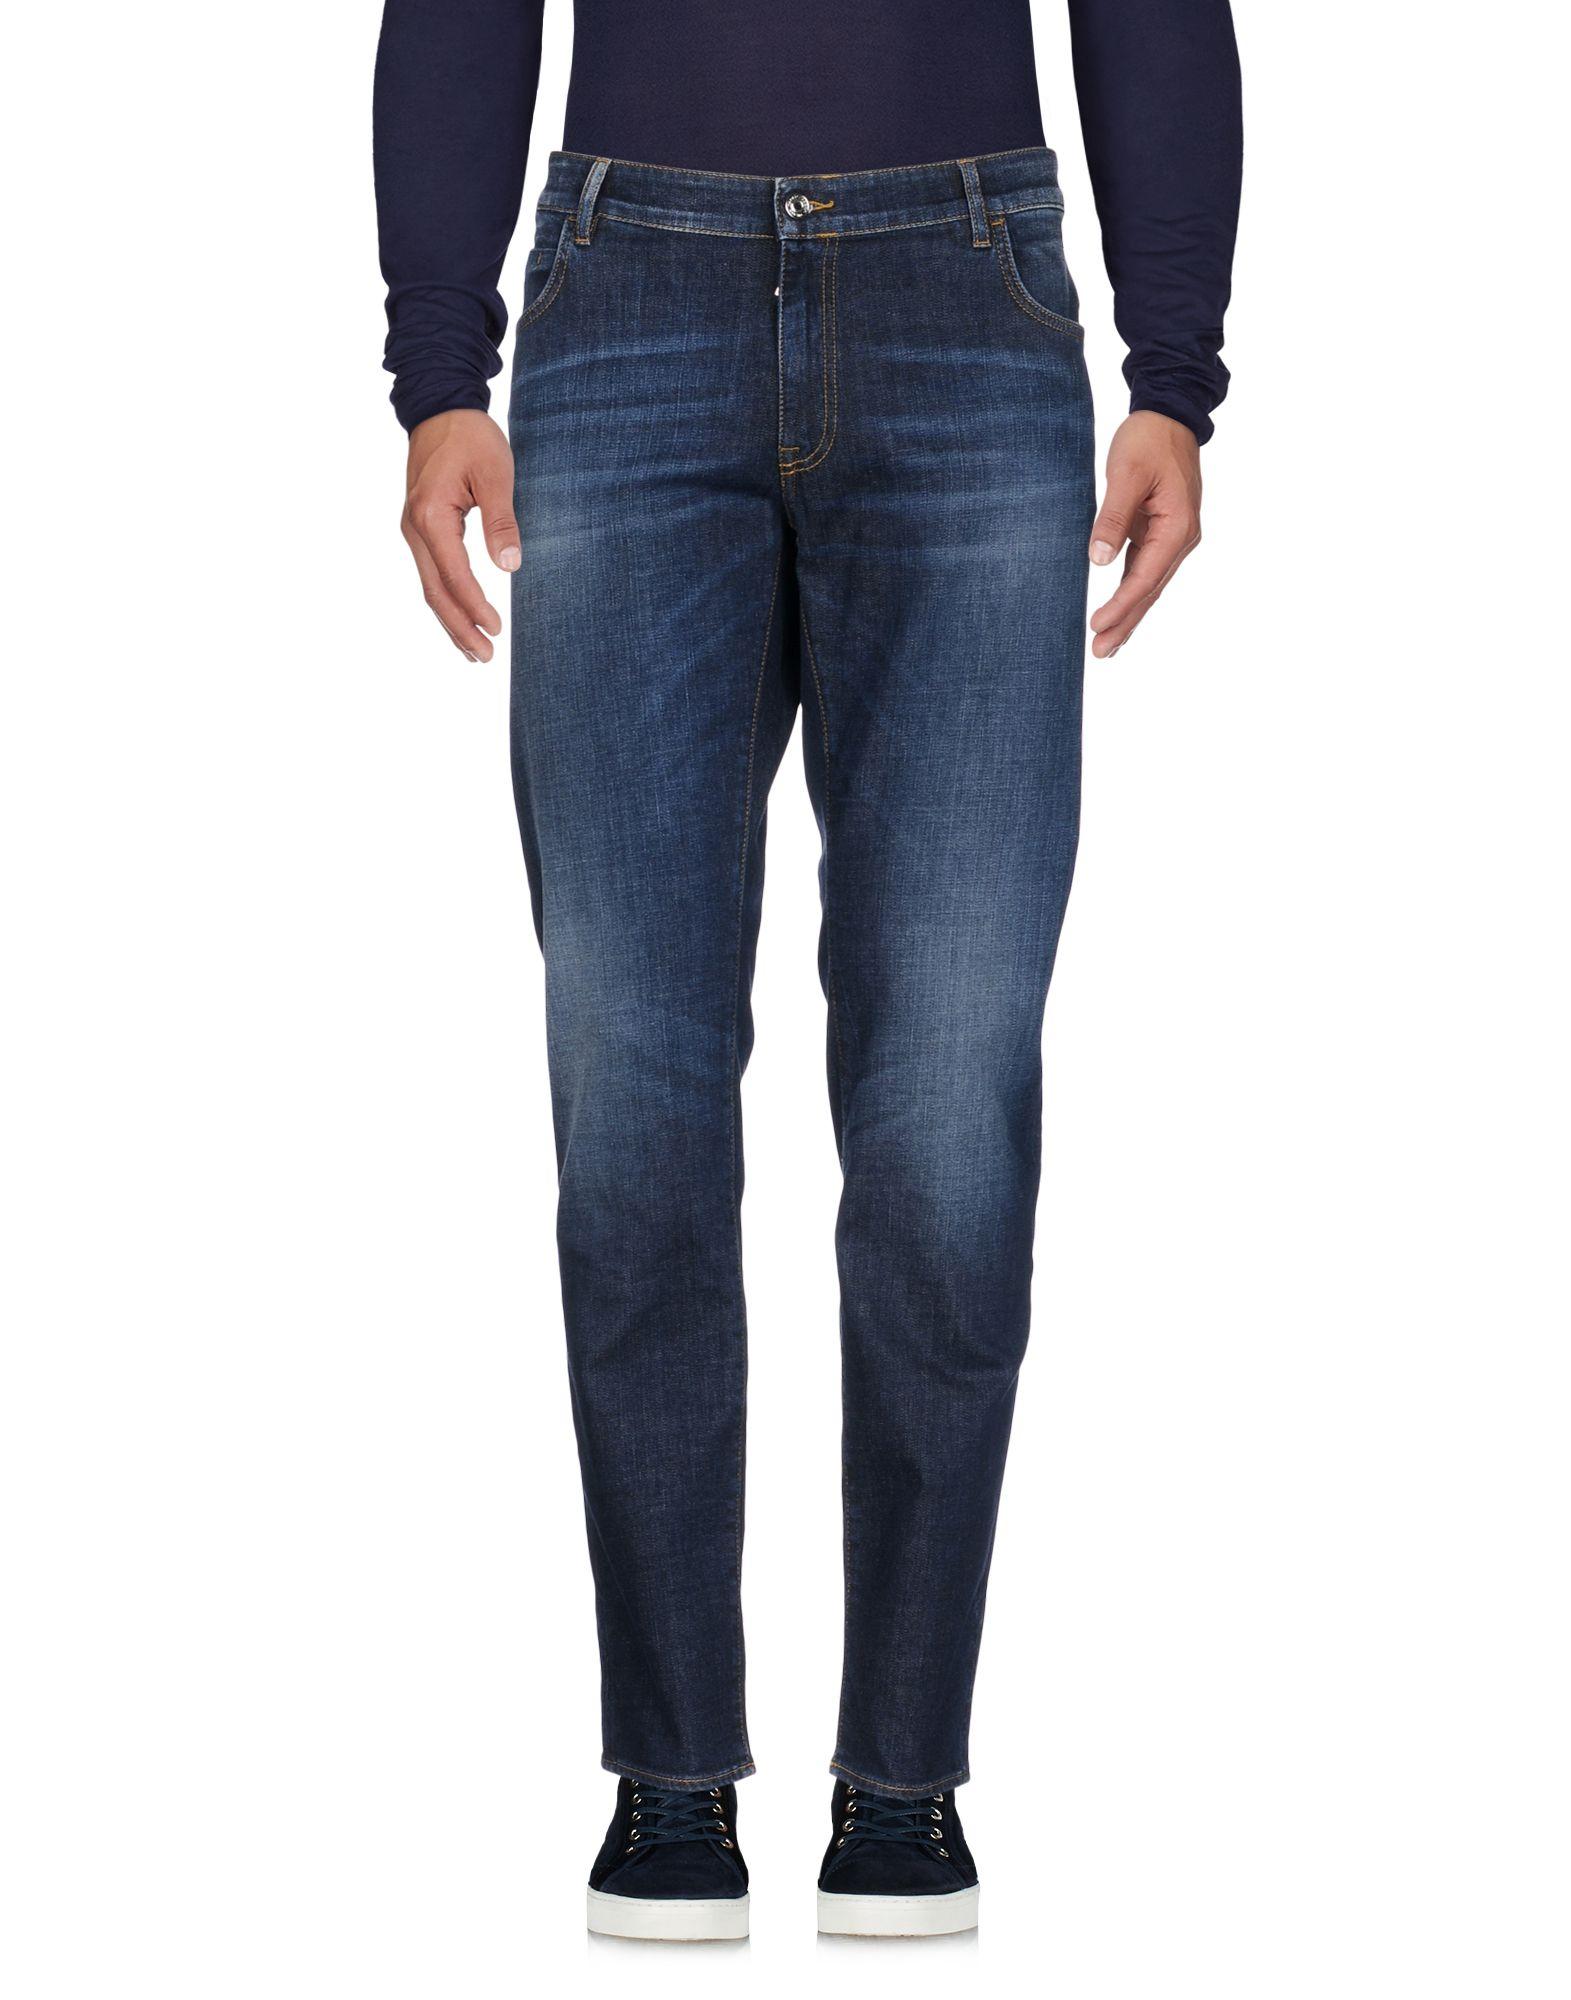 Pantaloni Jeans Jeans Jeans Paolo Pecora Uomo - 42681534GH d28538